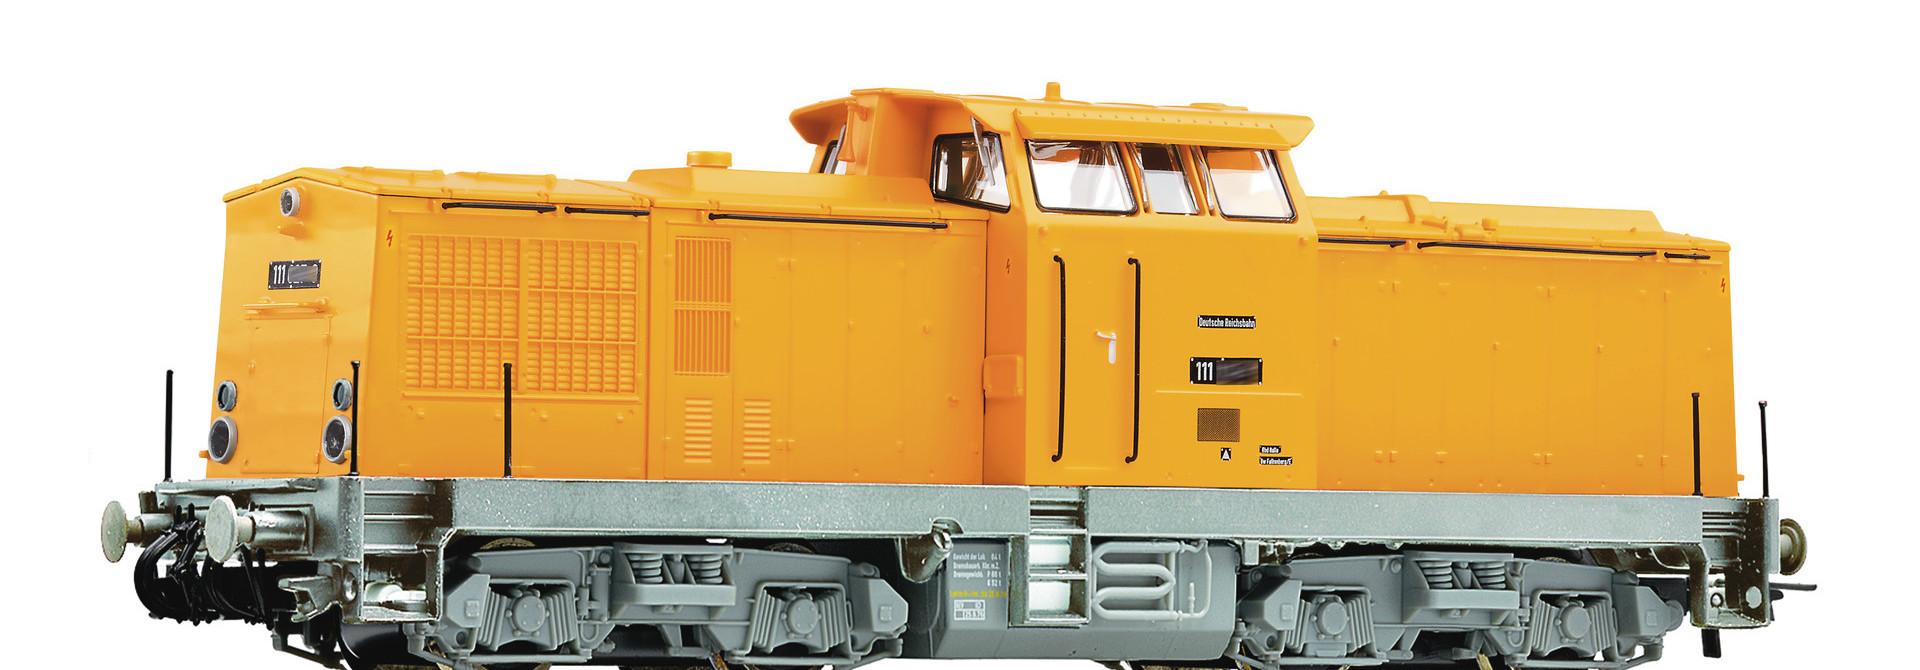 70813 Diesellok BR 111 orange